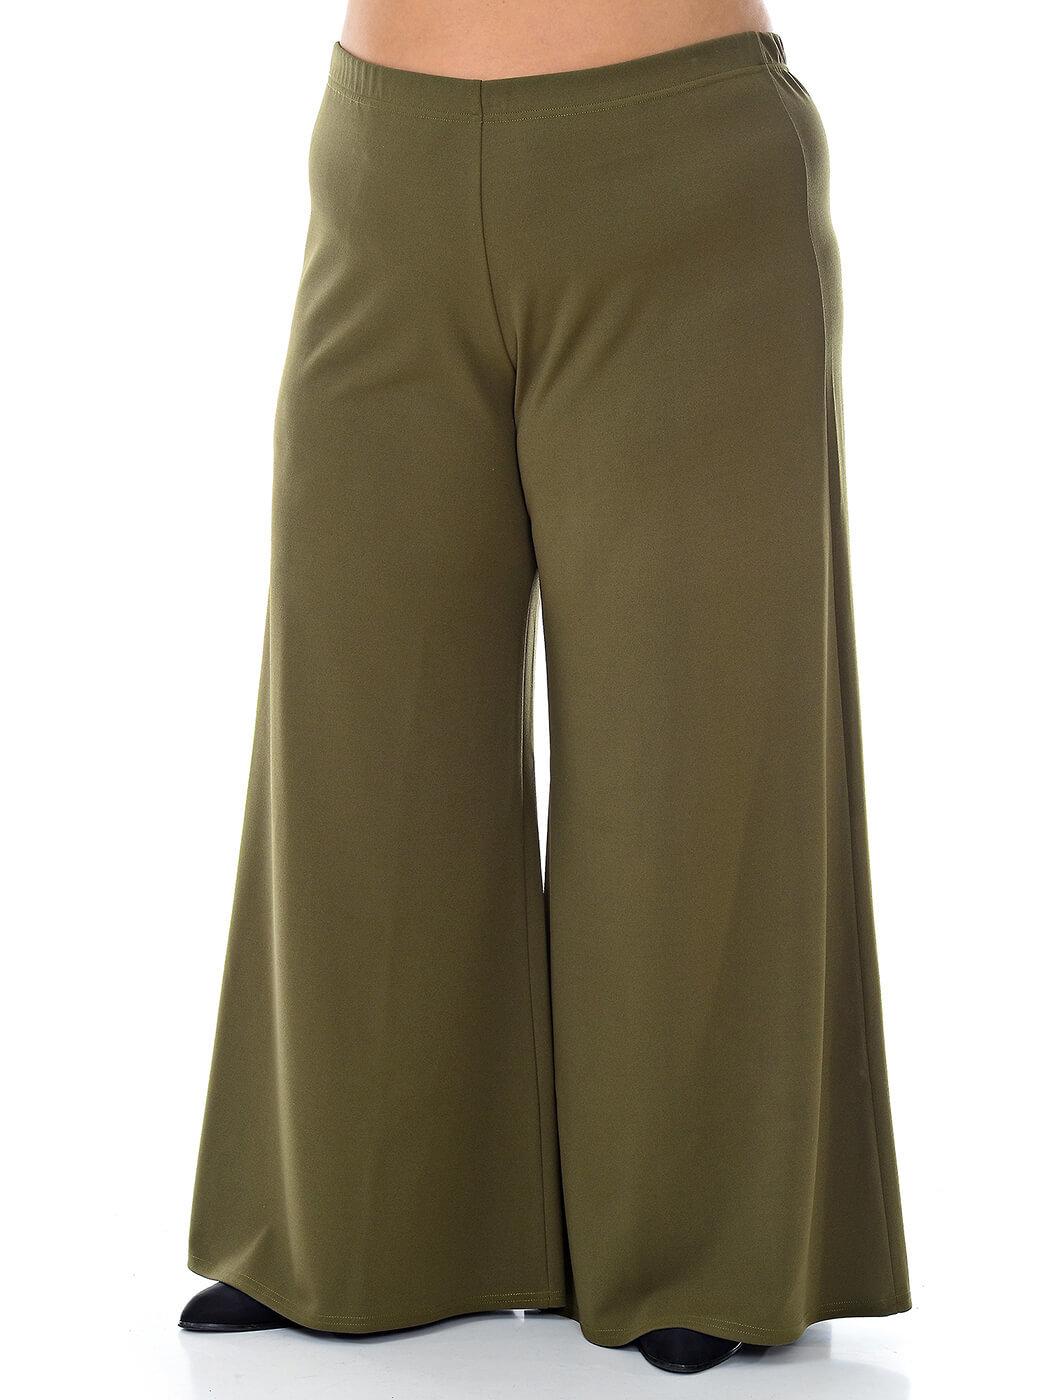 Широкие женские брюки 76 р хаки